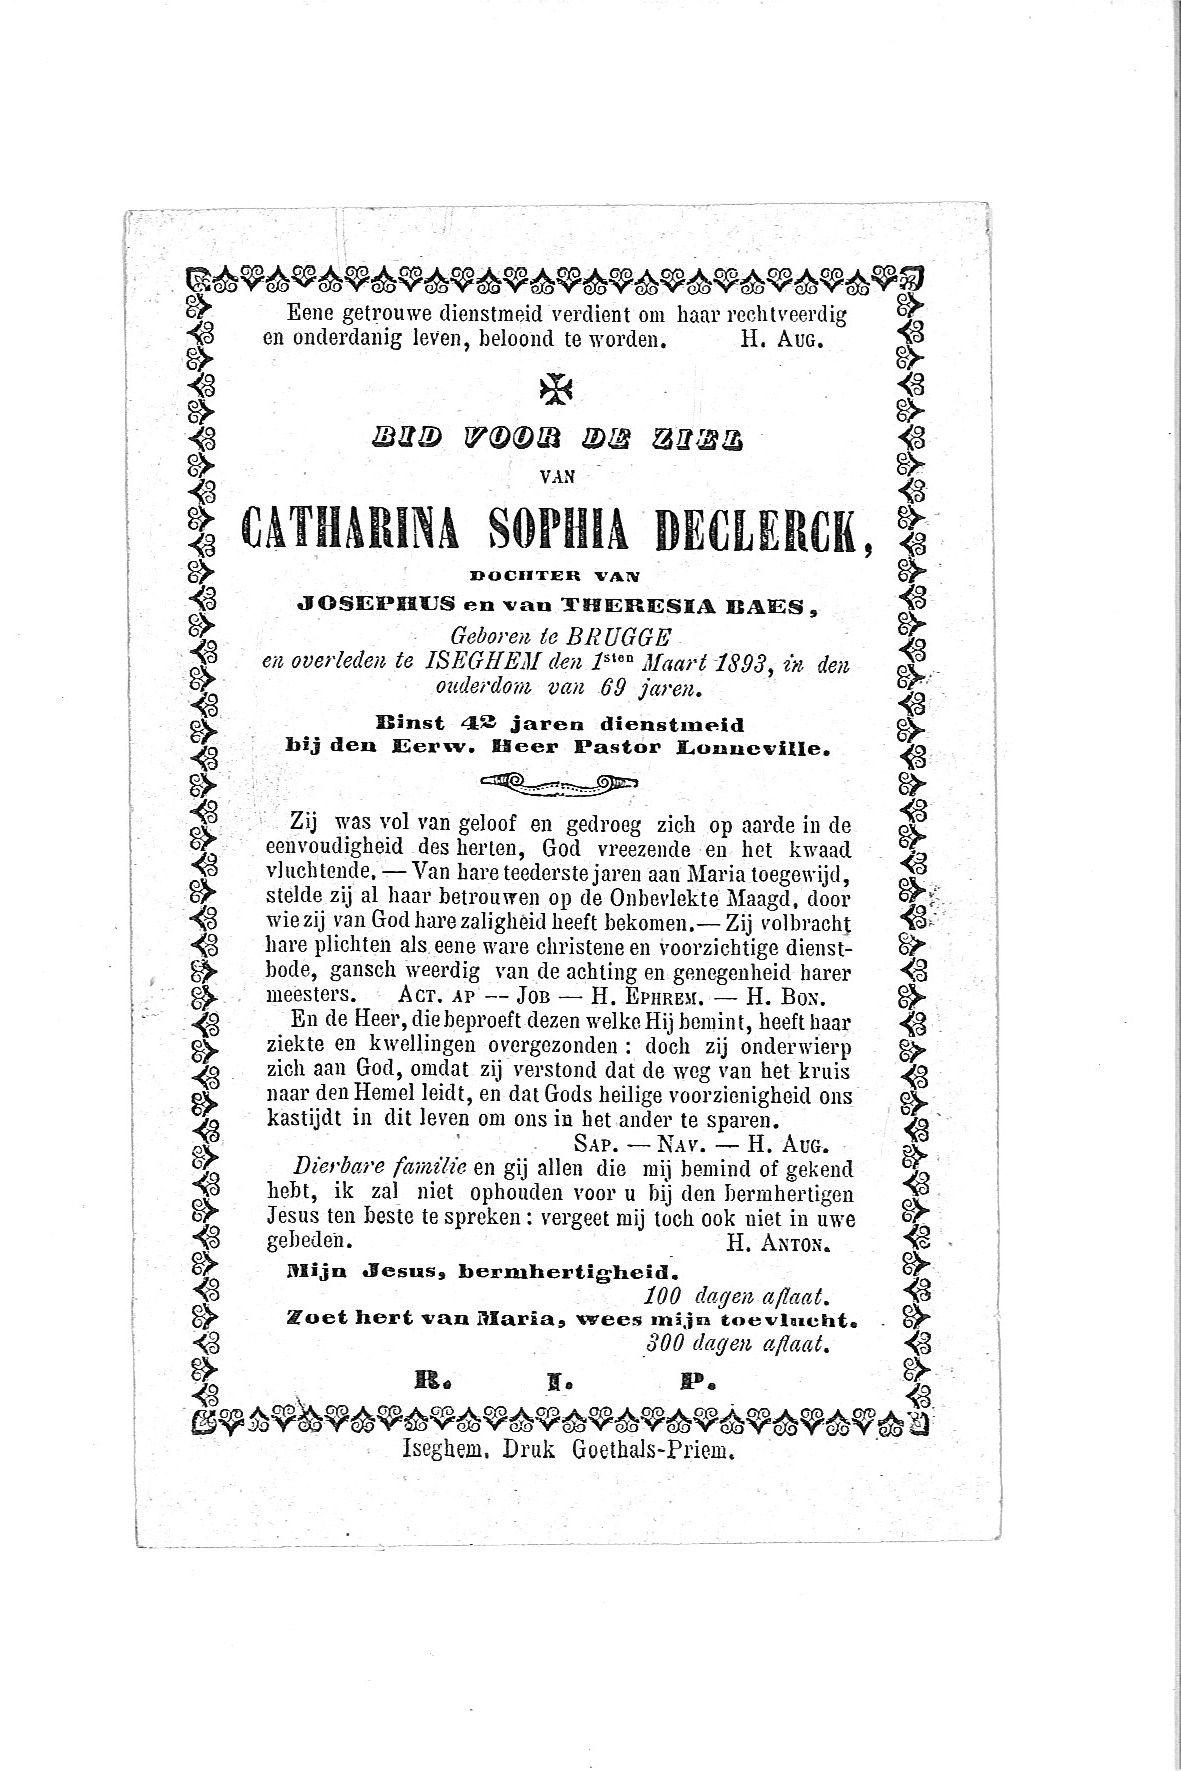 Catharina-Sophia(1893)20090903142539_00005.jpg